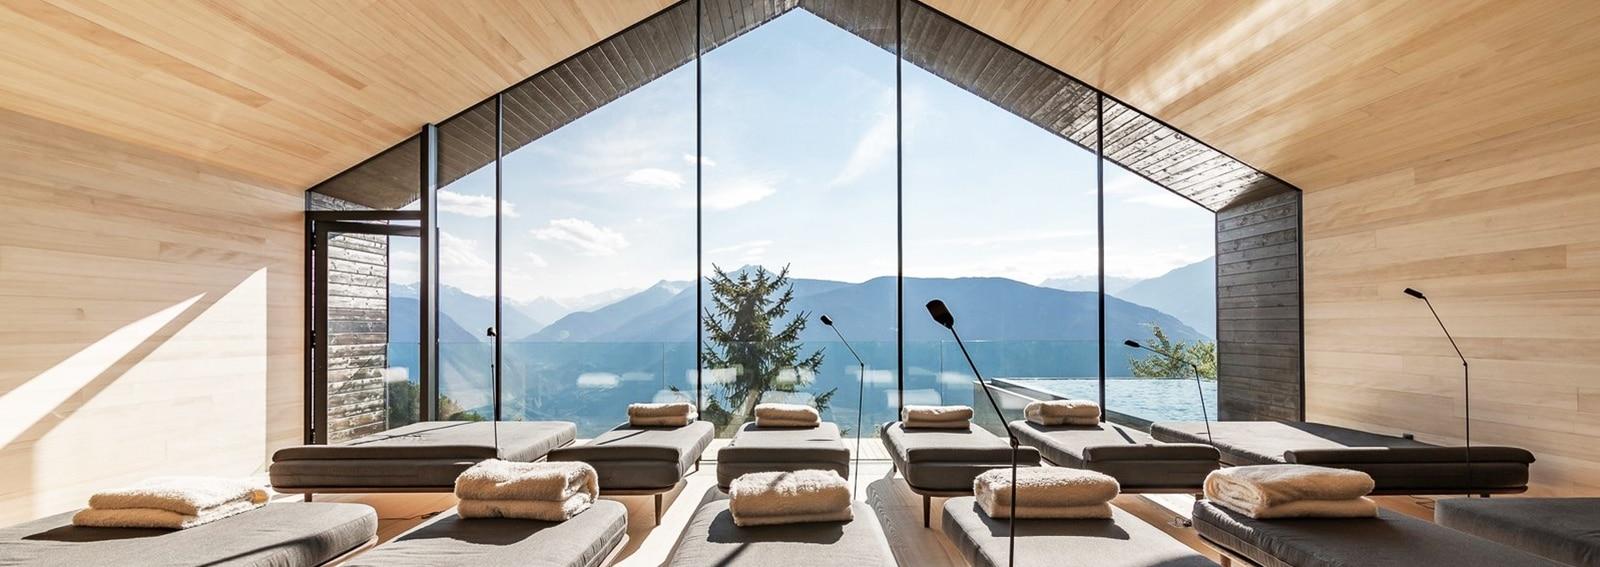 cover-hotel-design-montagna-desktop